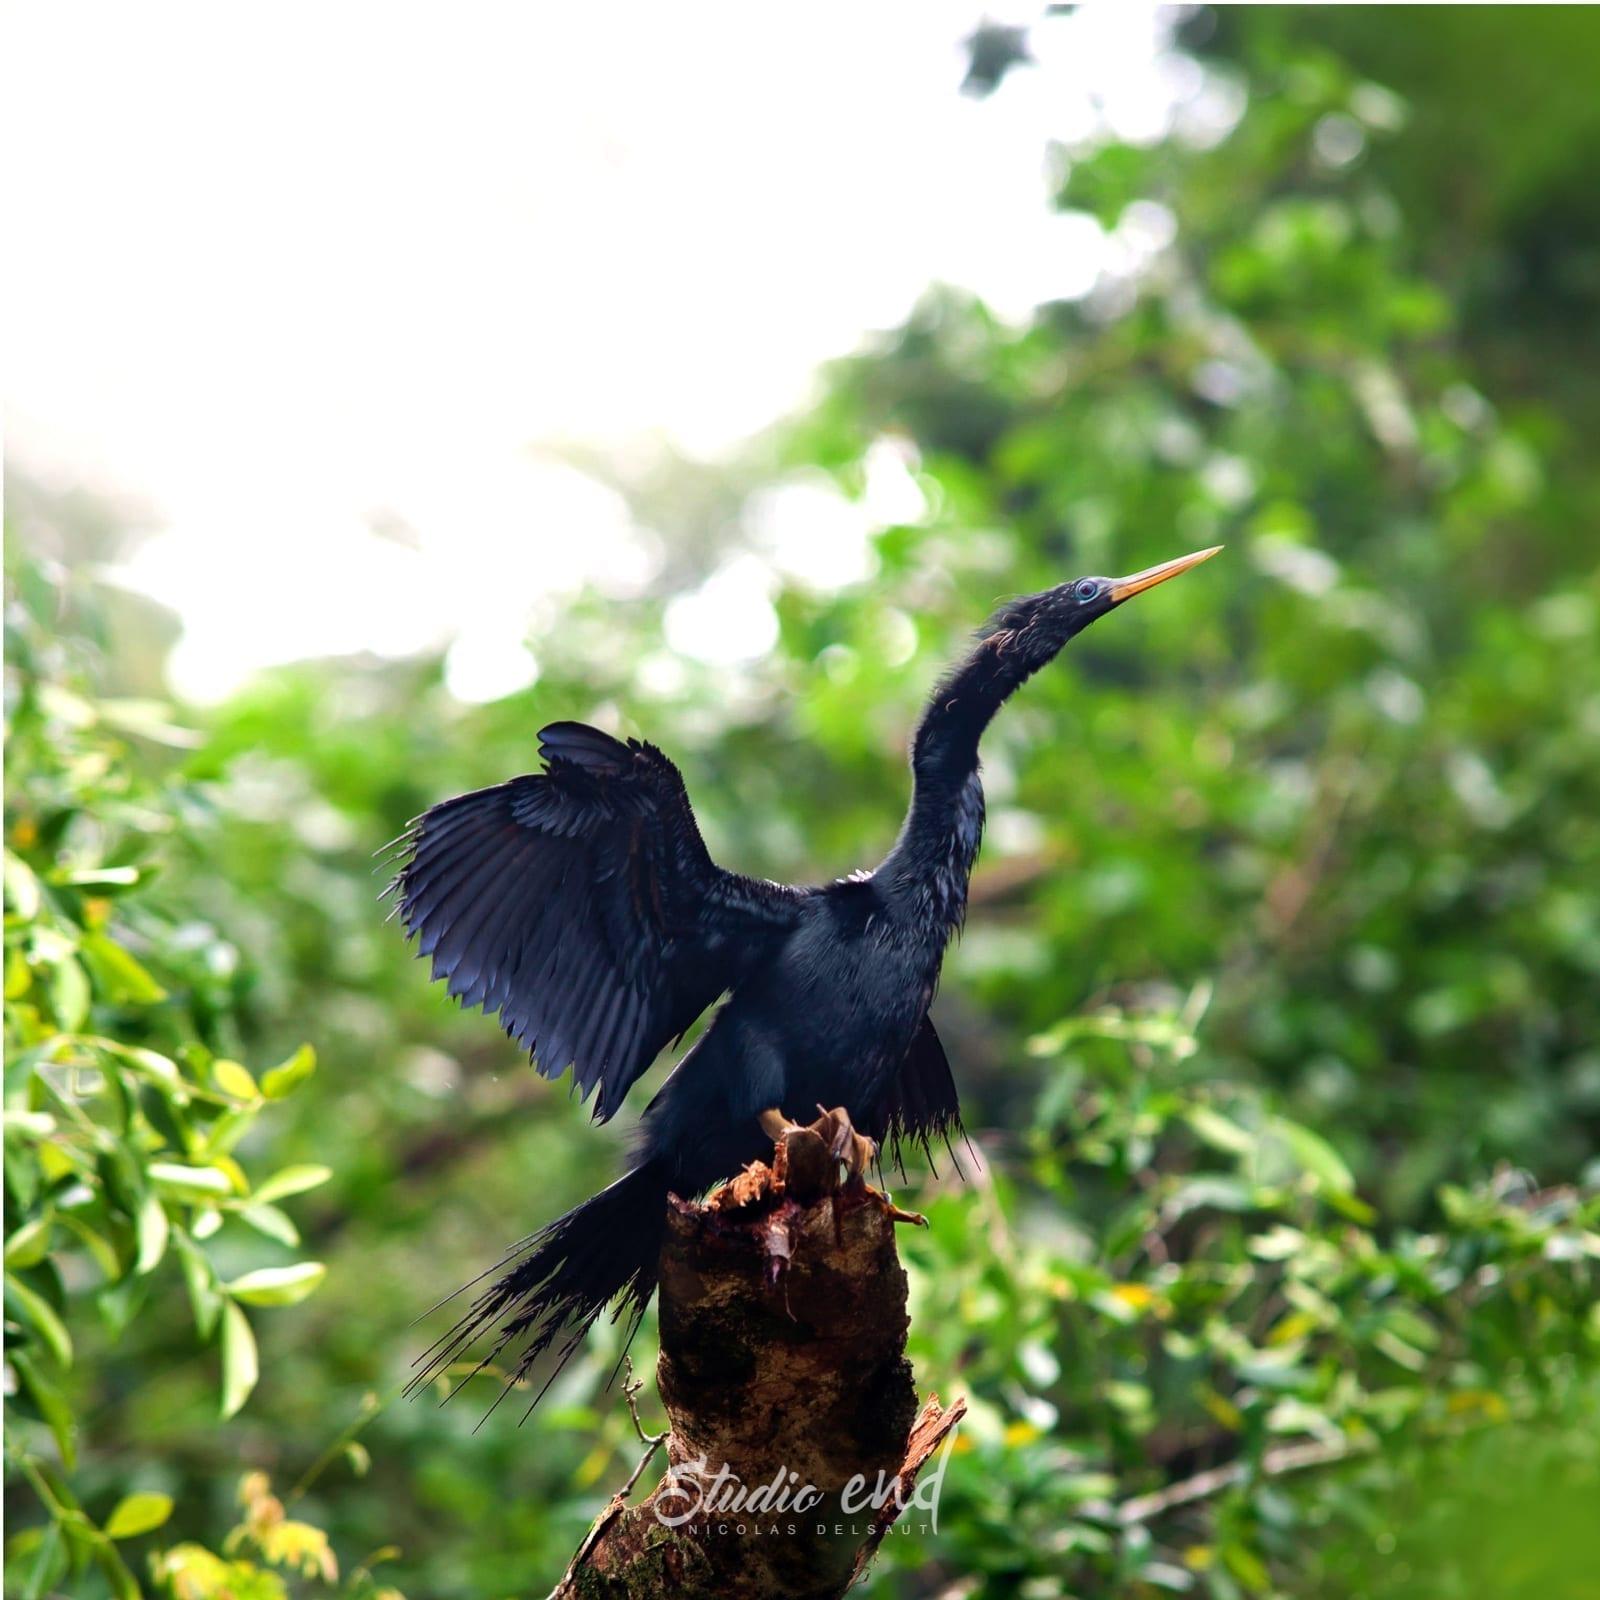 Photographie et reportage de voyage, animalier oiseau Costa Rica Nicolas Delsaut